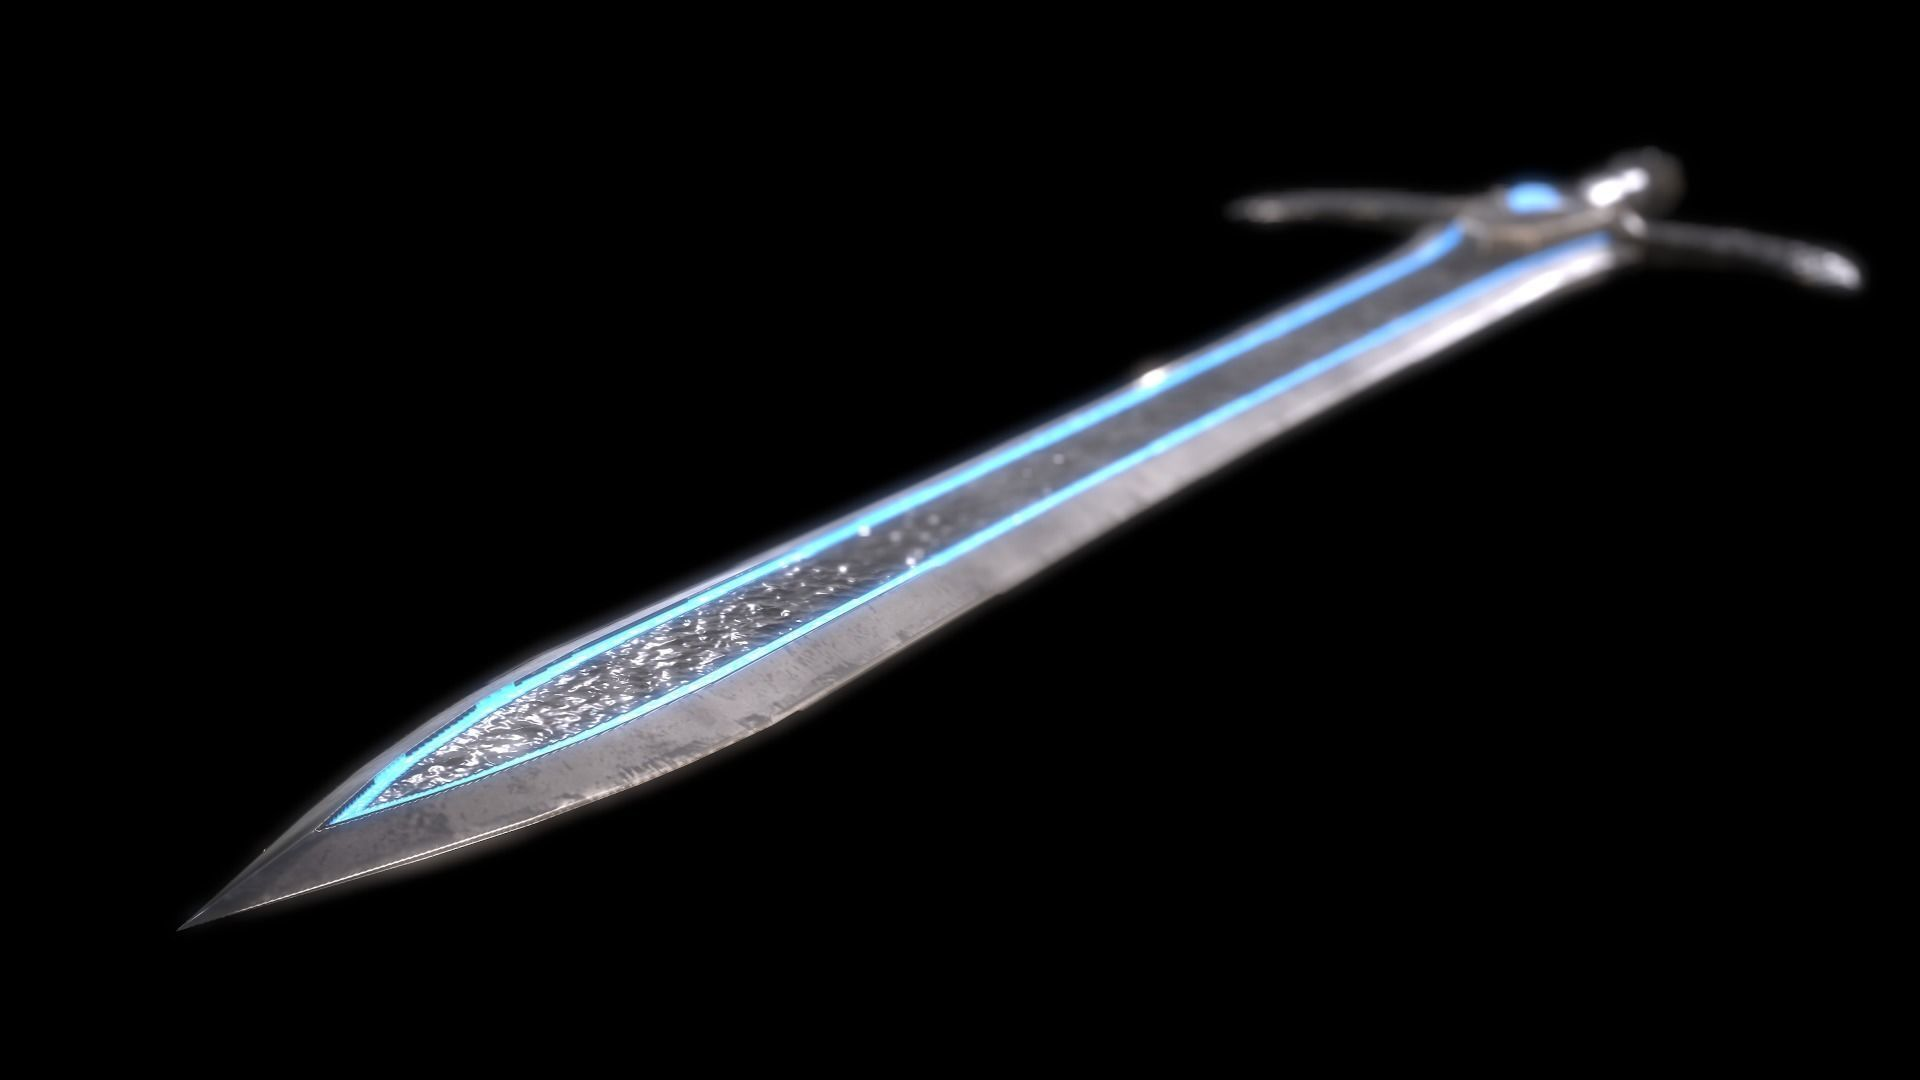 fantasy-magic-sword-pbr-3d-model-low-poly-obj-fbx-dae-unitypackage.jpg